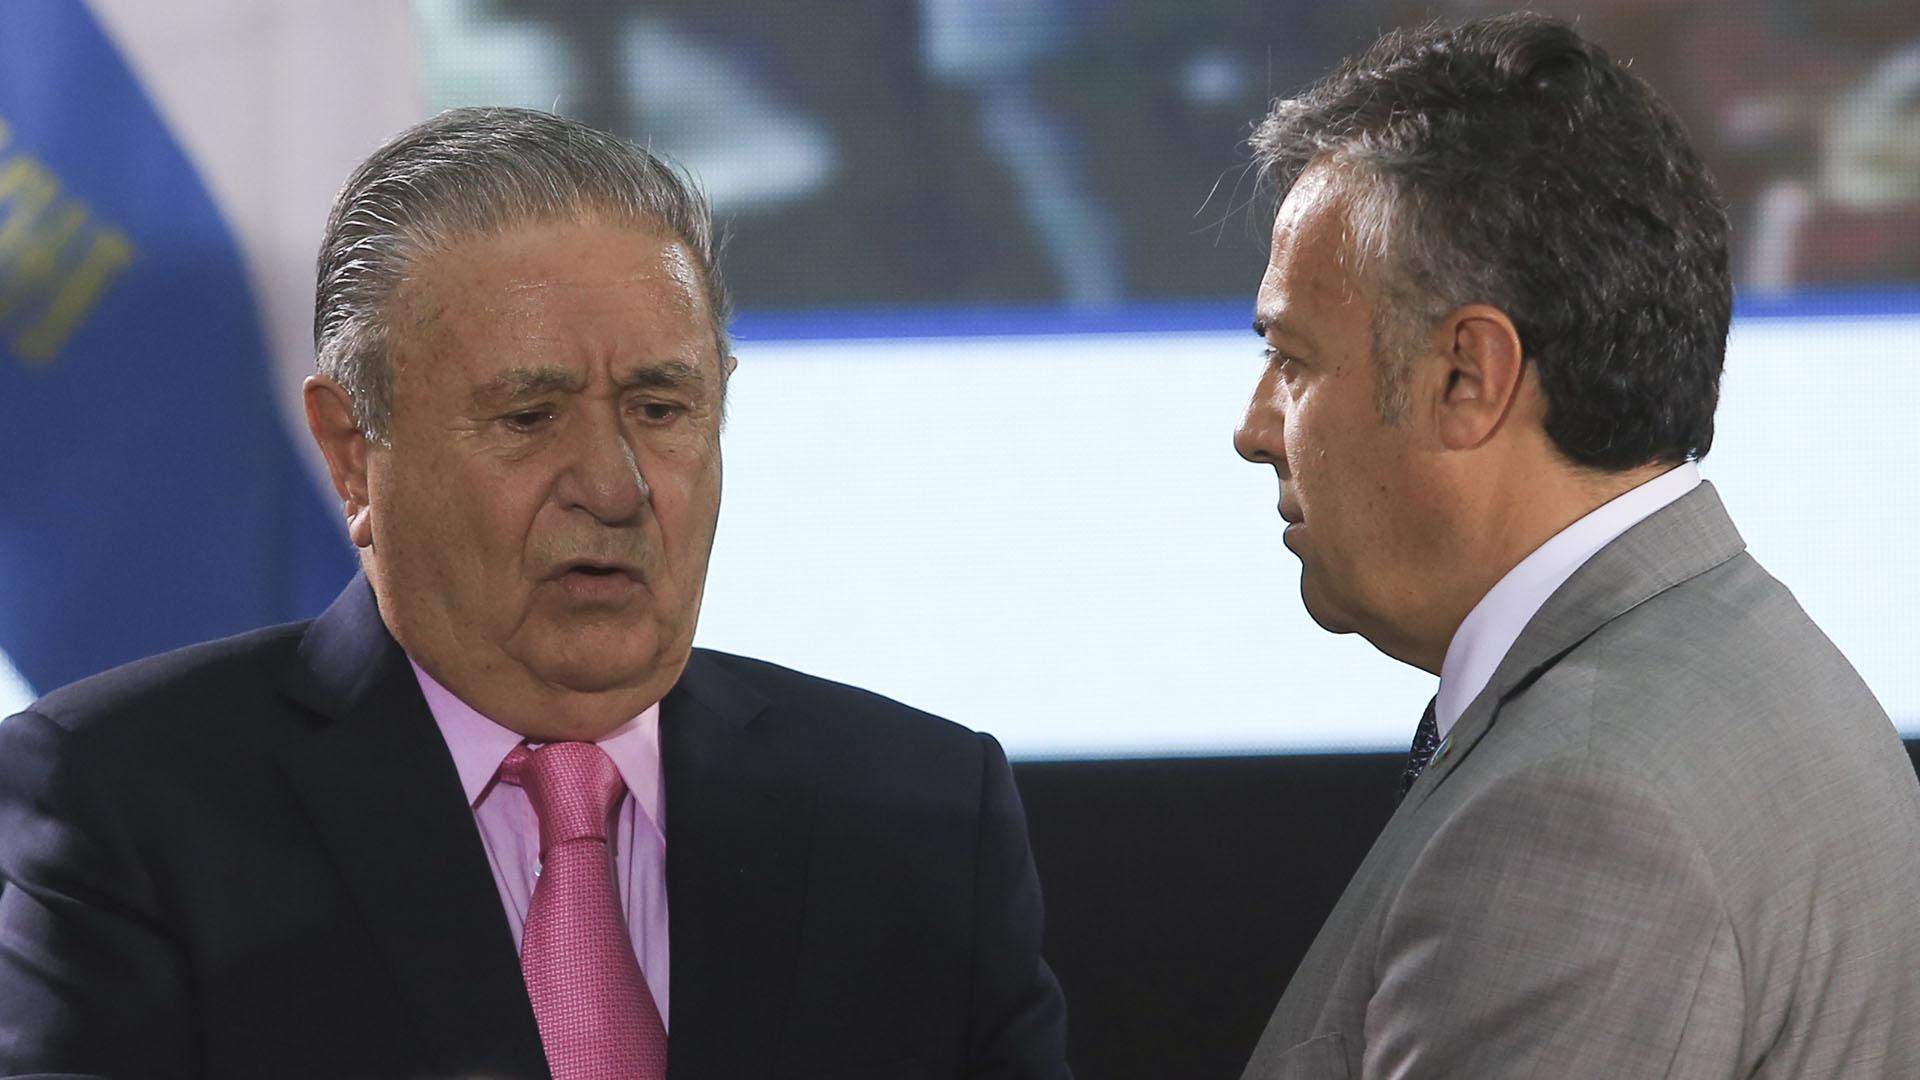 El ex presidente Eduardo Duhalde junto al gobernador de Mendoza, Alfredo Cornejo